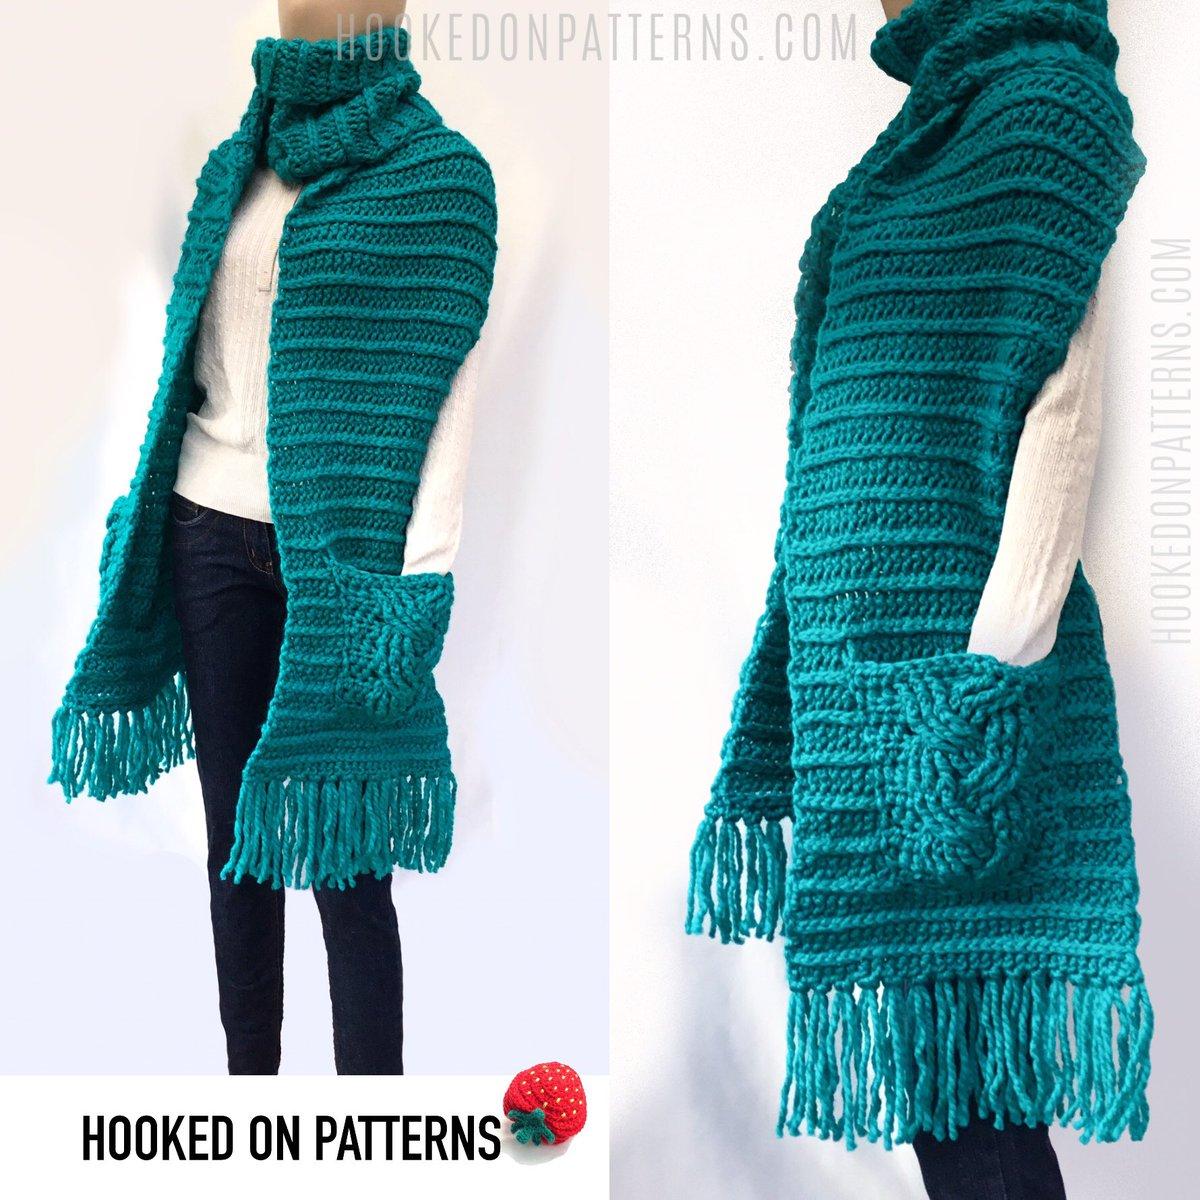 9a08b28ed8b ... on my blog  https   hookedonpatterns.com crochet-blog free-crochet -scarf-pattern-super-chunky …  crochet  lovecrochet  freepattern  scarf   yarn  winter ...